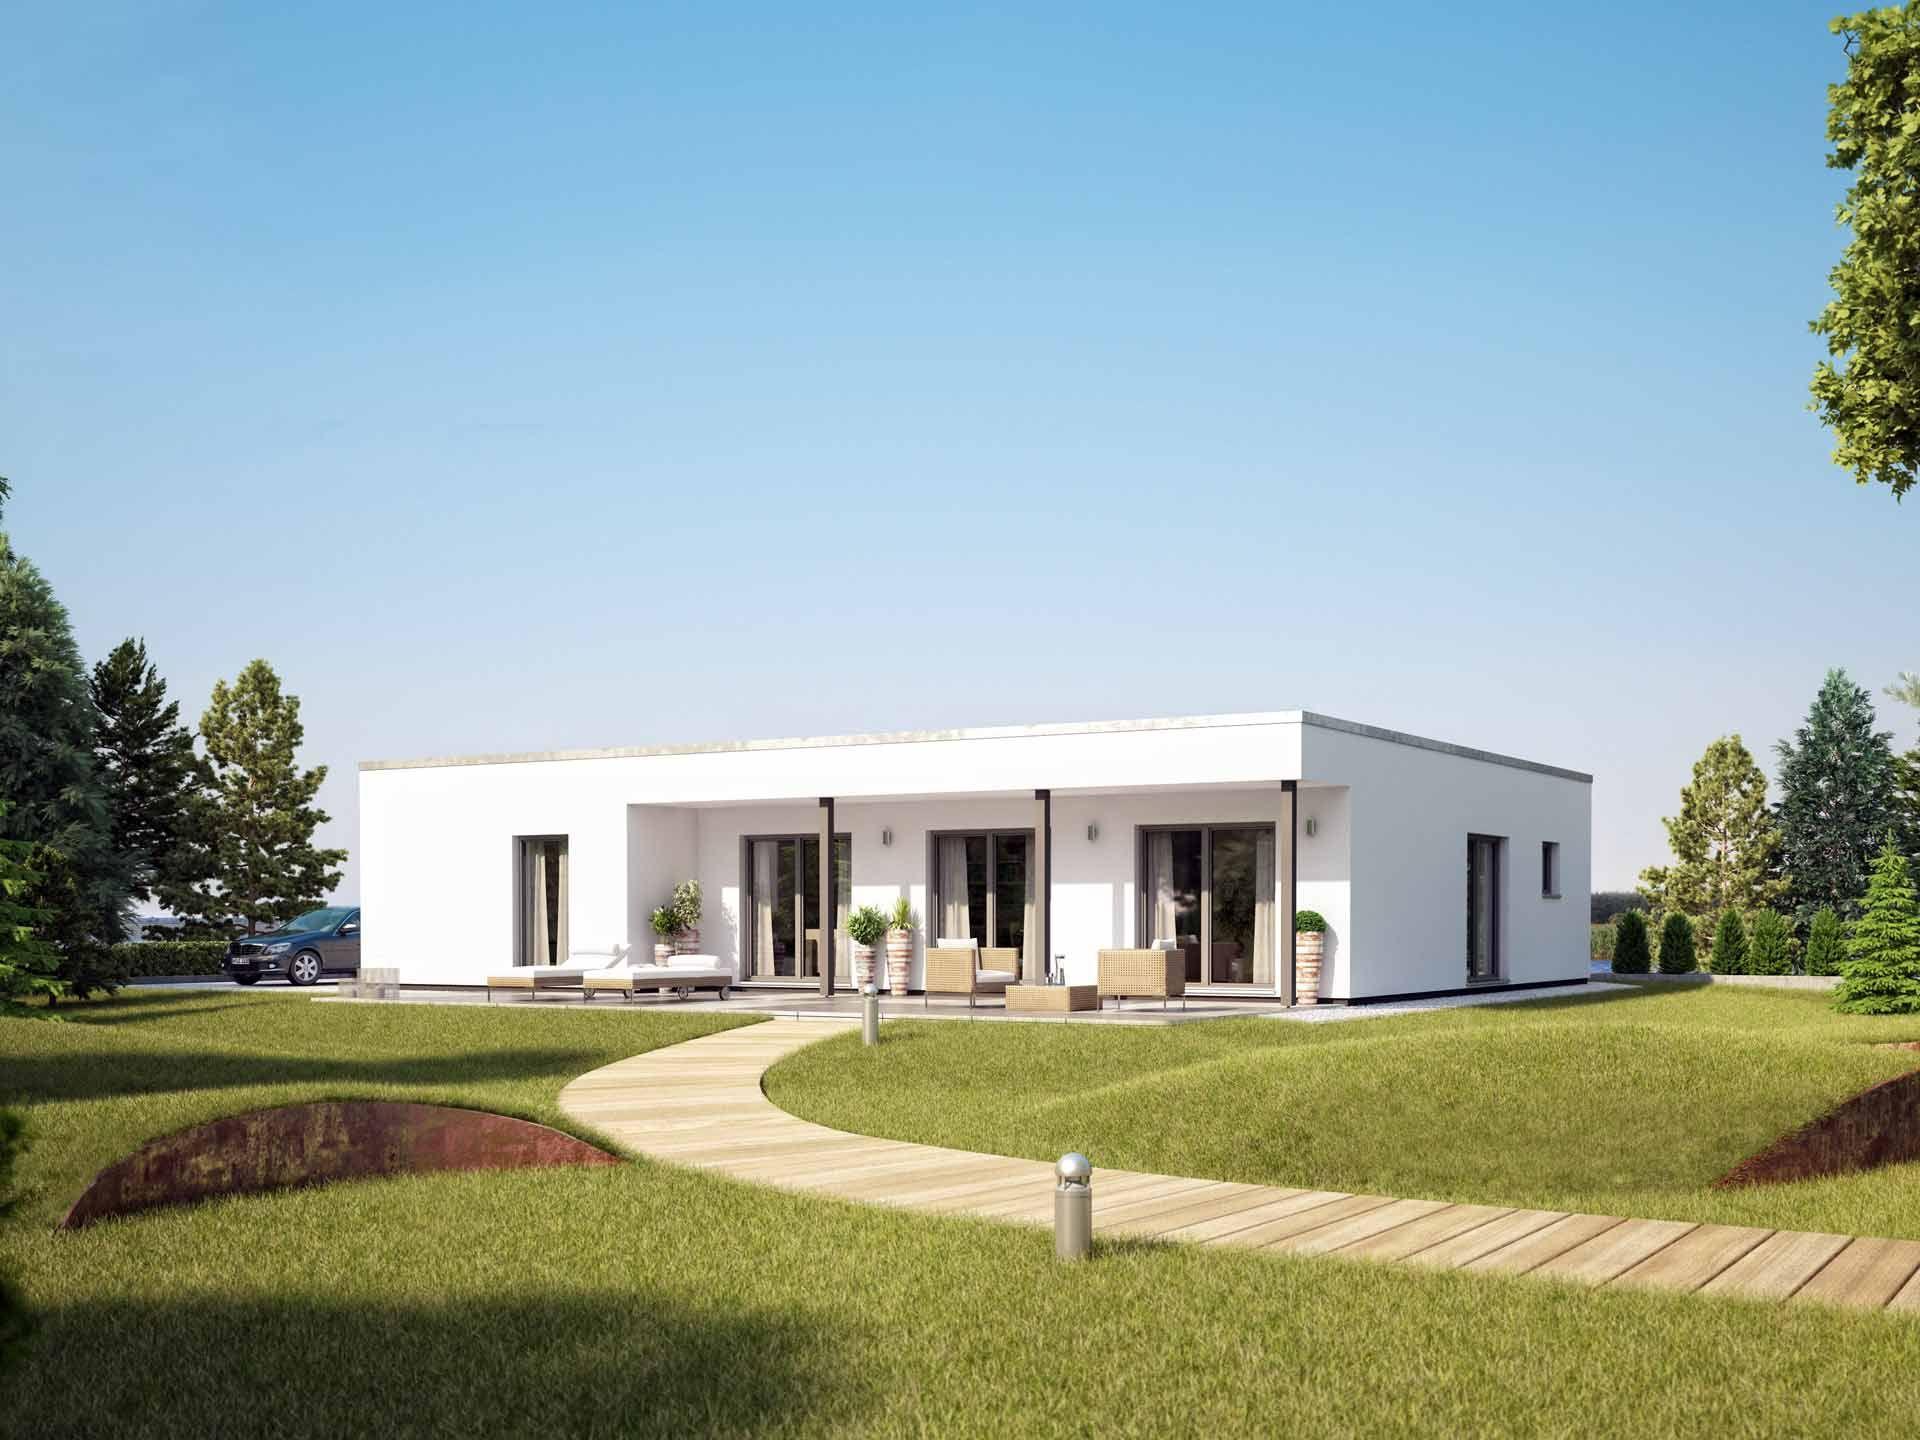 Bungalow NIVO 140 F FingerHaus in 2020 Haus, Style at